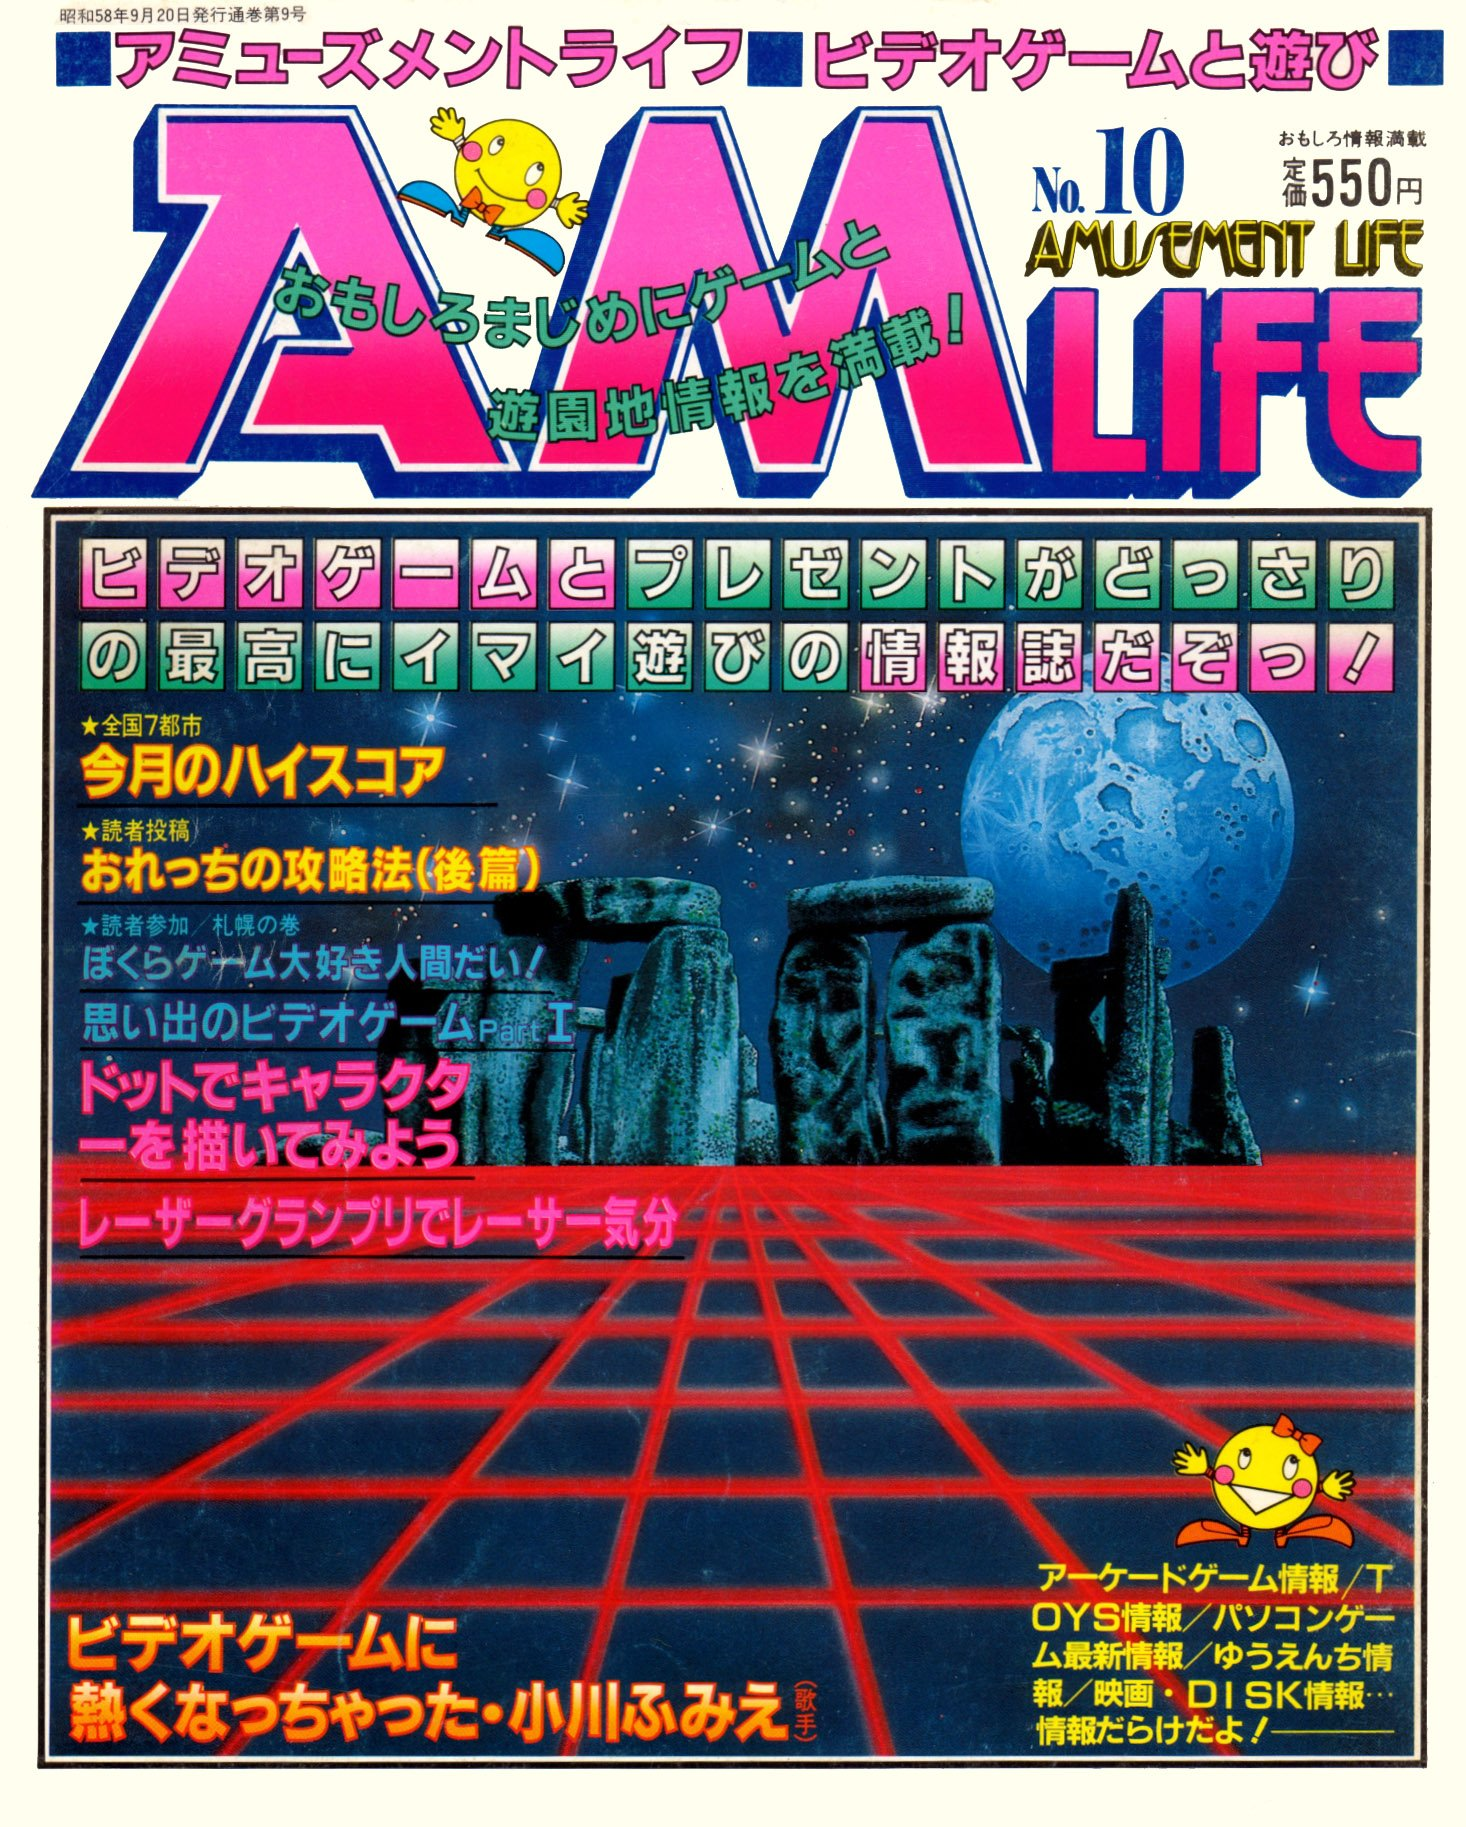 Amusement Life Issue 10 (September 1983)